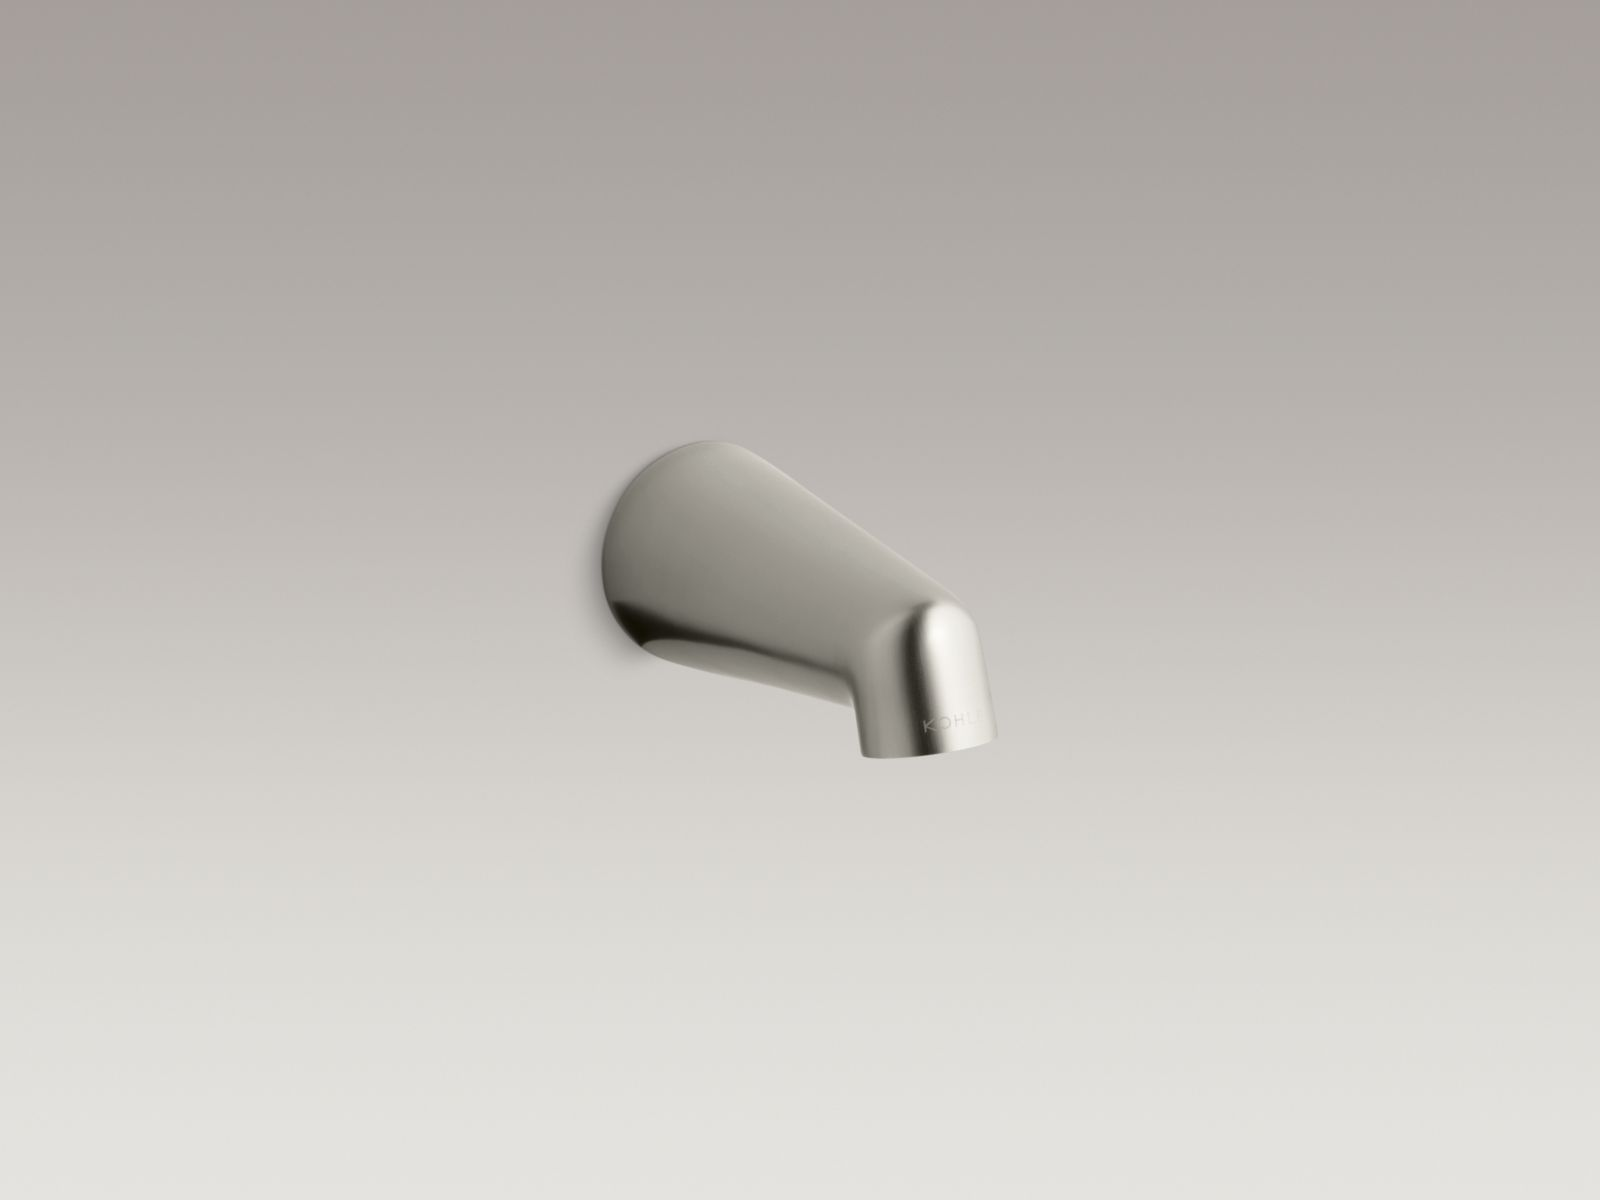 "Kohler K-6854-BN Standard Wall-mounted 5"" Non-diverter Bathtub Spout Vibrant Brushed Nickel"